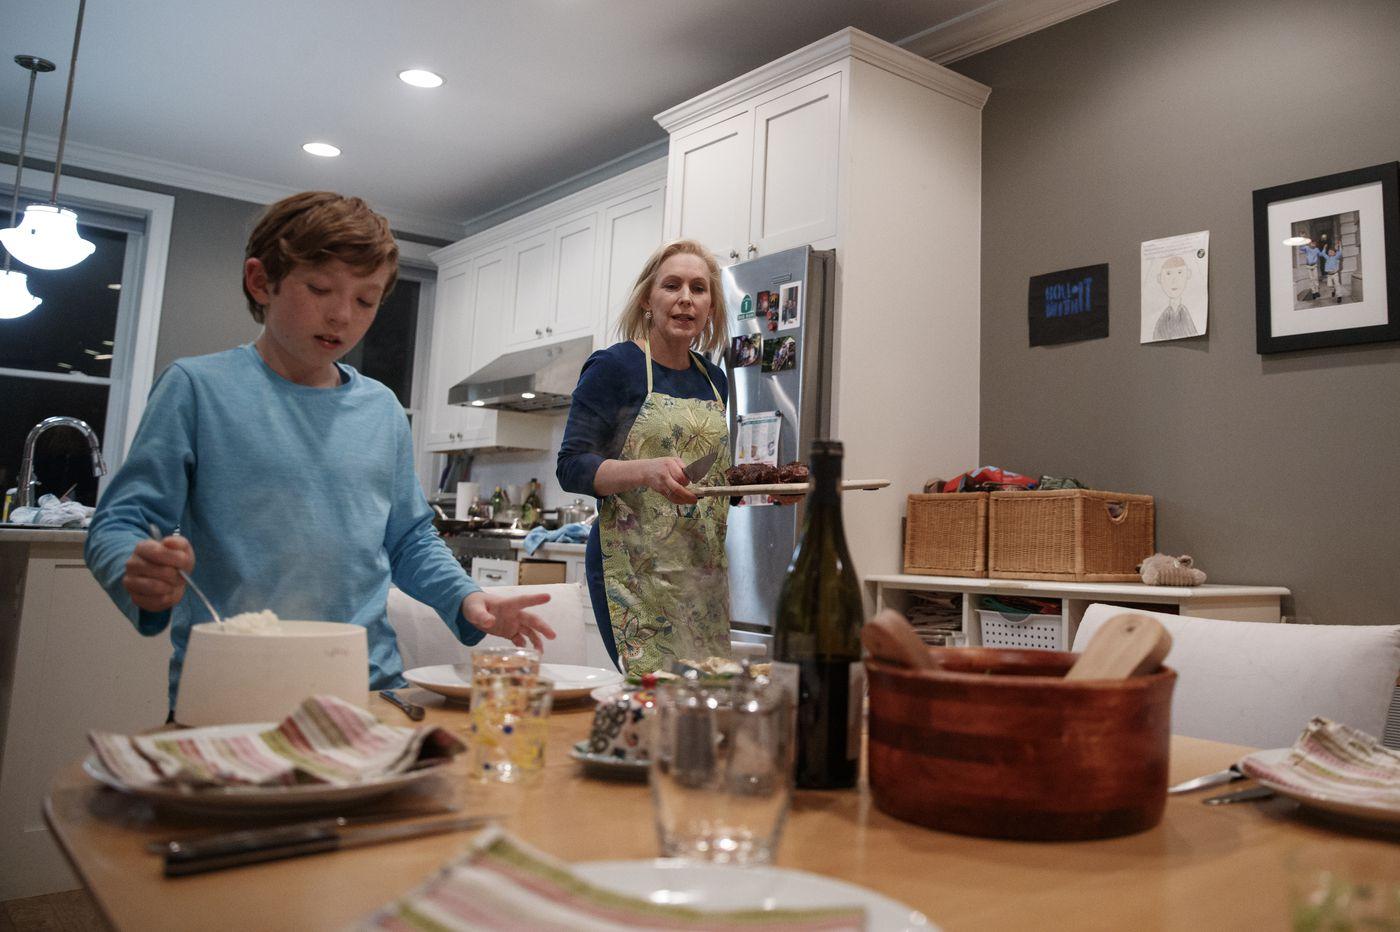 'Carer-feeder': Gillibrand plays up motherhood in 2020 race